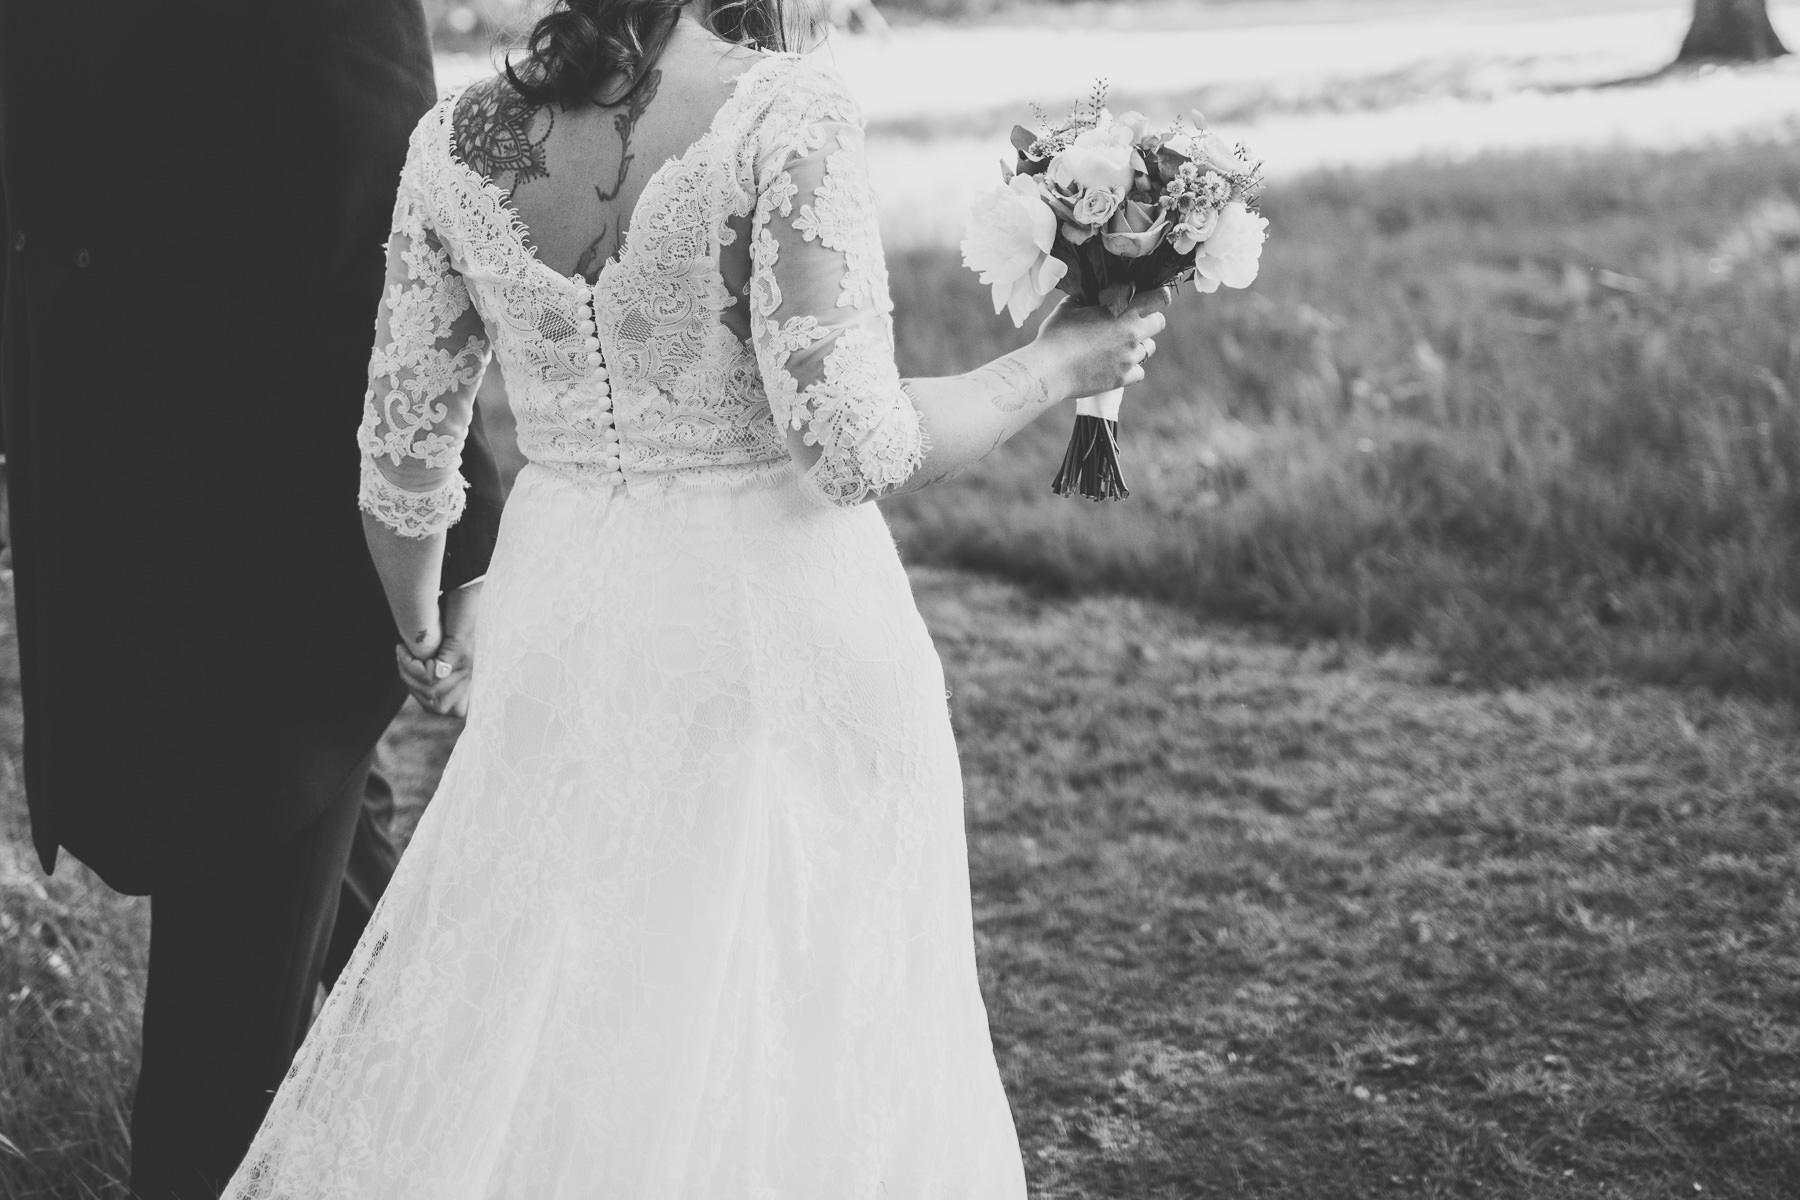 Pamber-Place-wedding-photography-basingstoke-hampshire-184